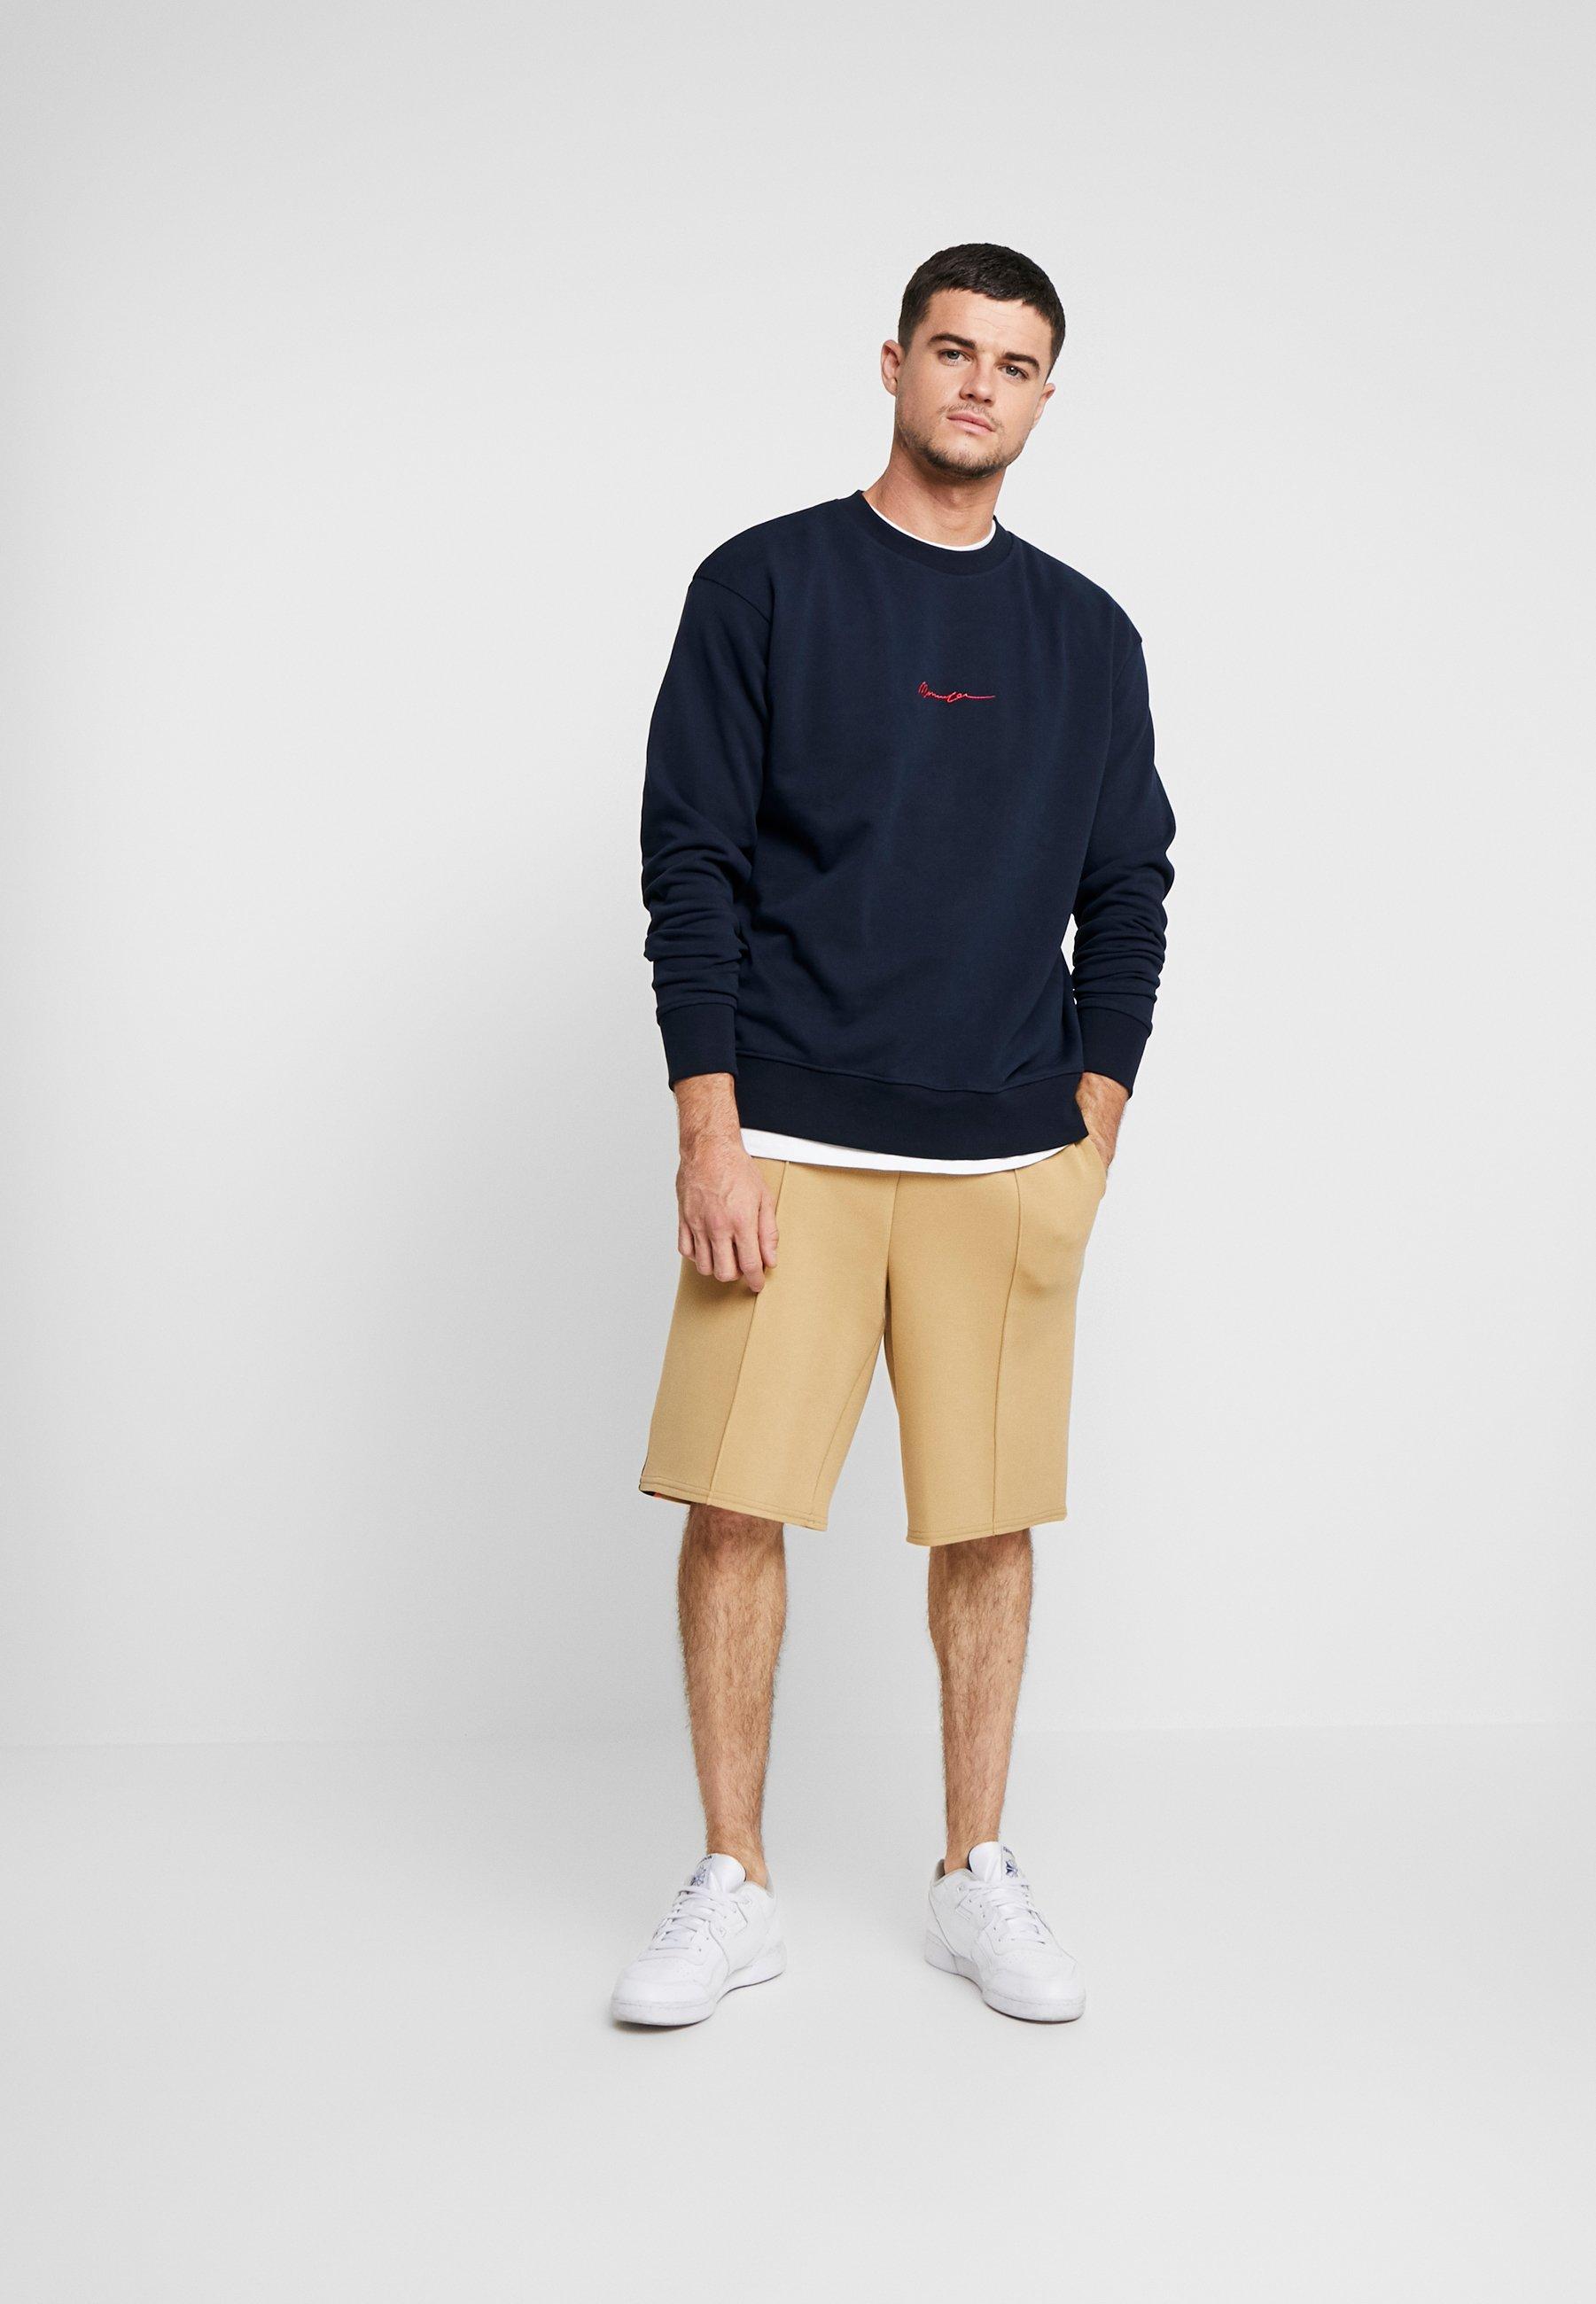 Mennace Contrast Signature - Sweatshirt Navy/mørkeblå